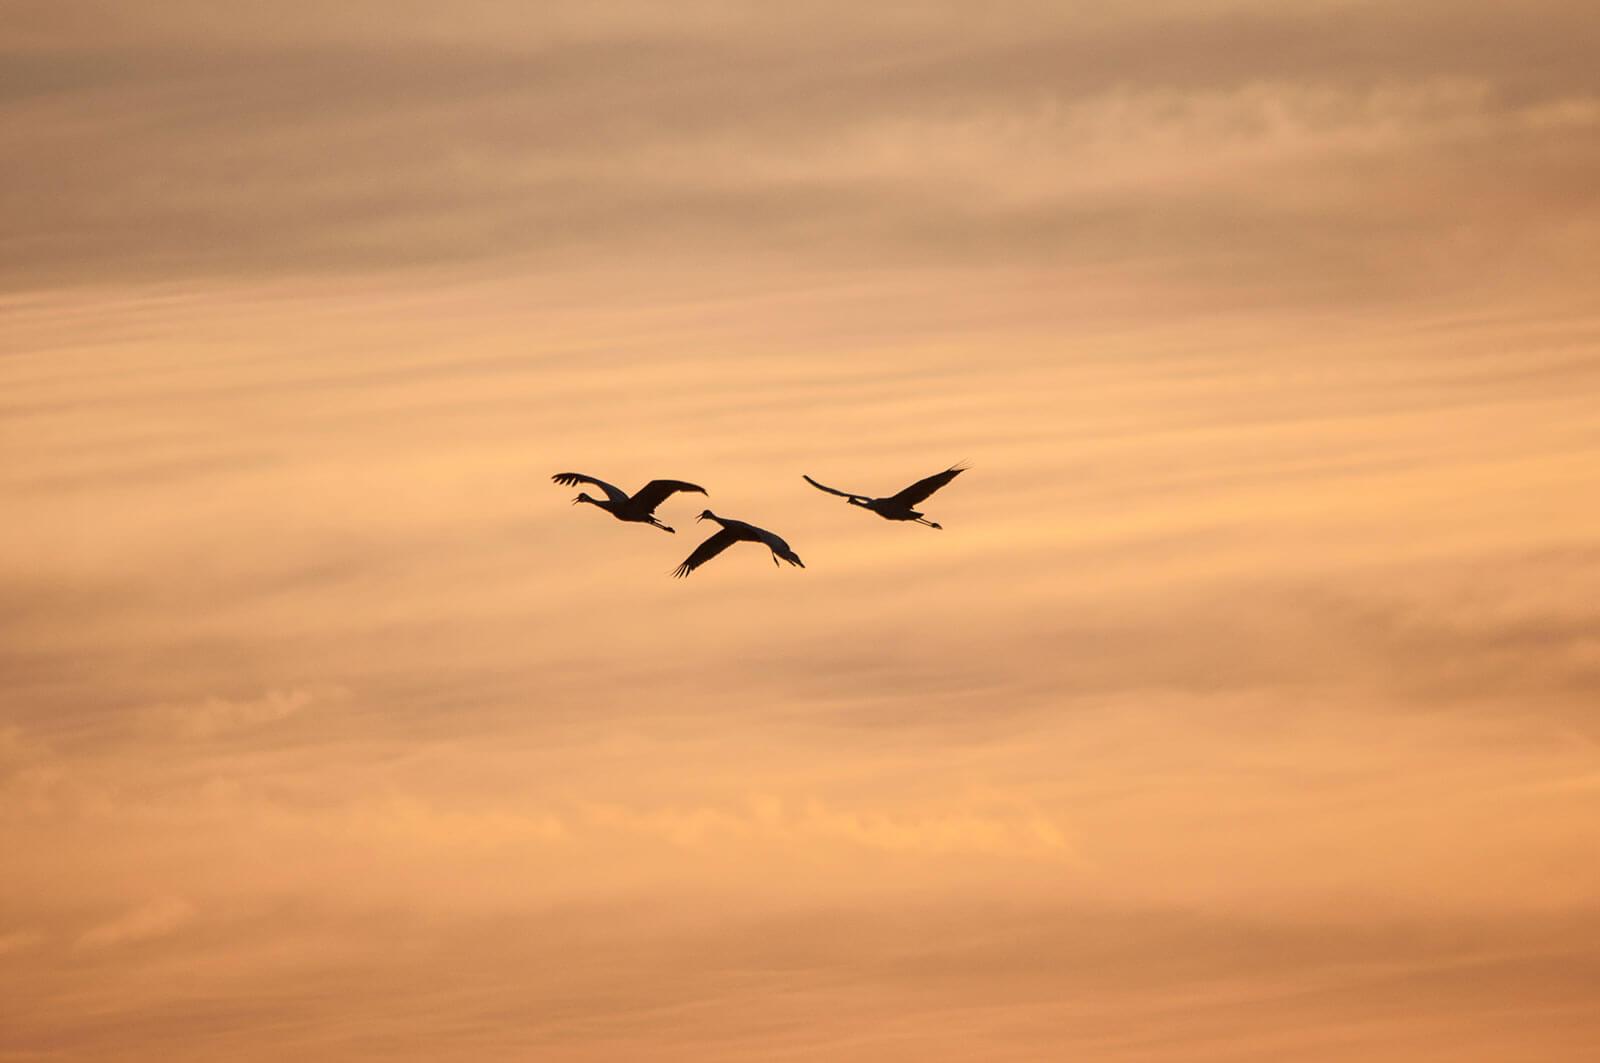 Bando de pássaros a voar ao pôr-do-sol.